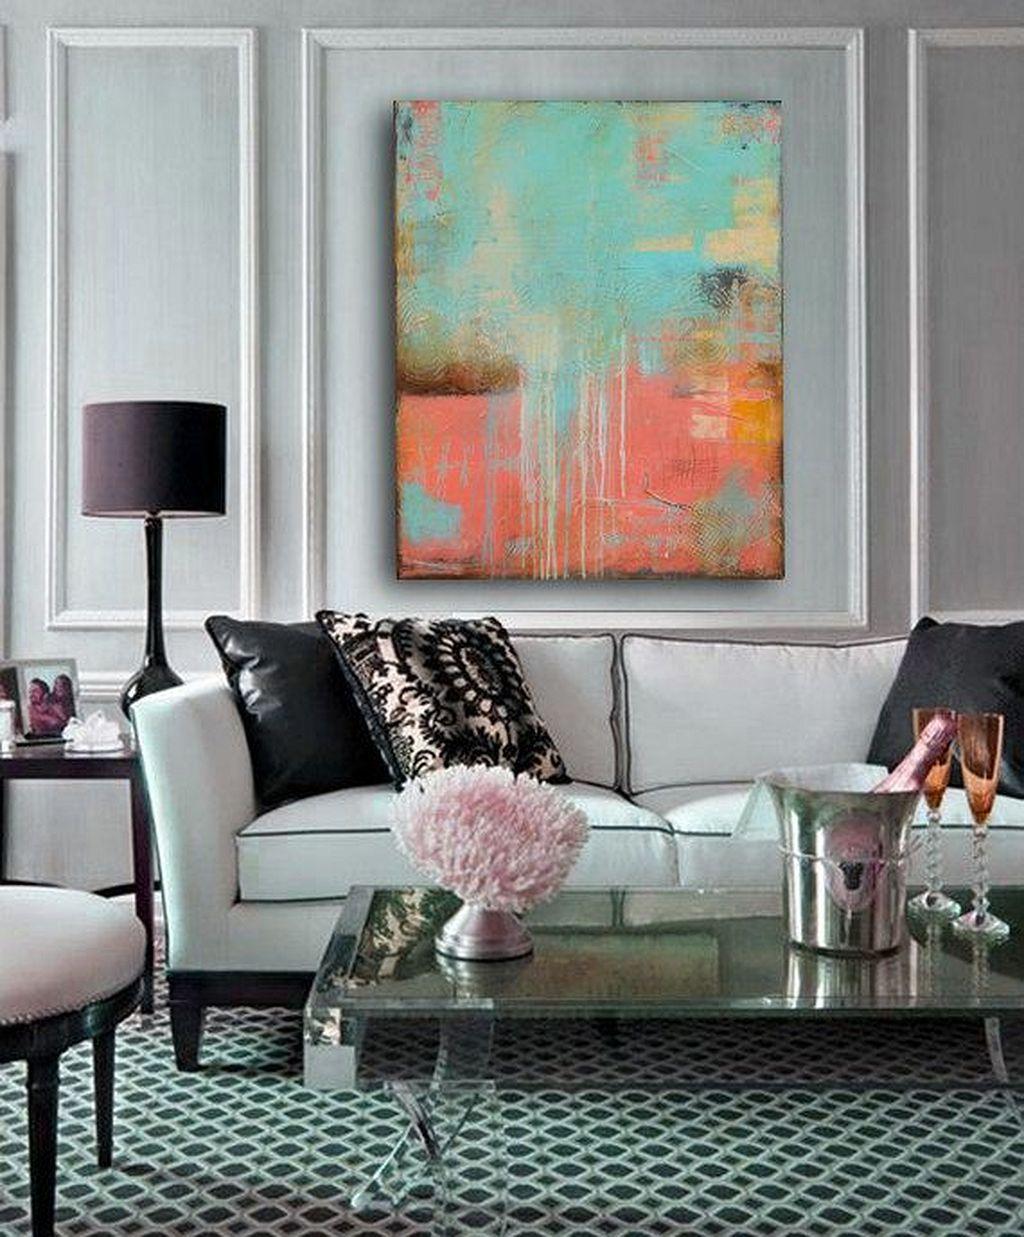 127 Contemporary Wall Decor Ideas For Living Room   Room ...